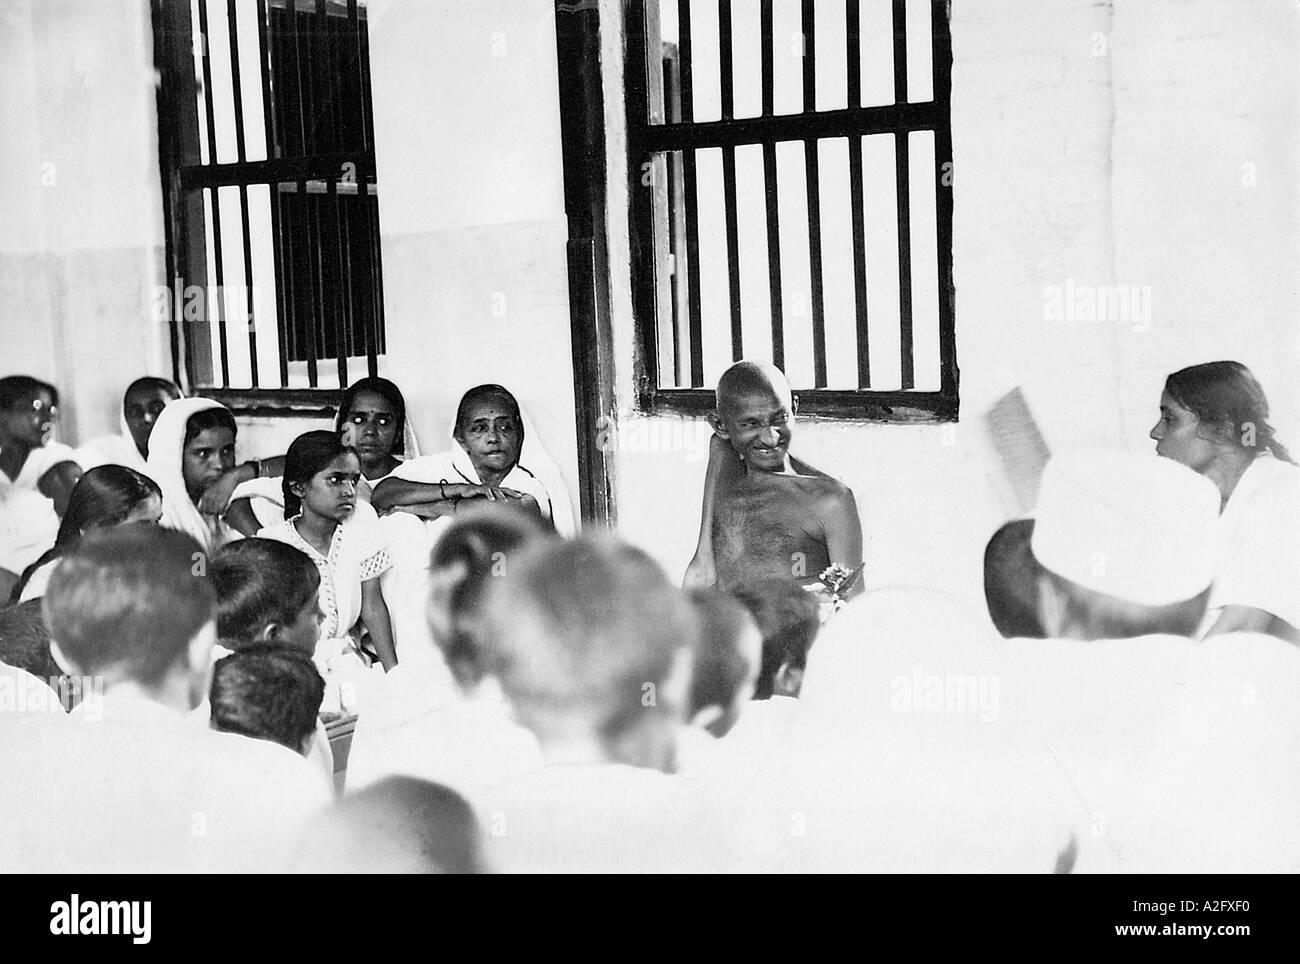 MKG33030 Mahatma Gandhi with his ashram workers at Sabarmati Ashram Ahmedabad Gujarat India 1929 - Stock Image